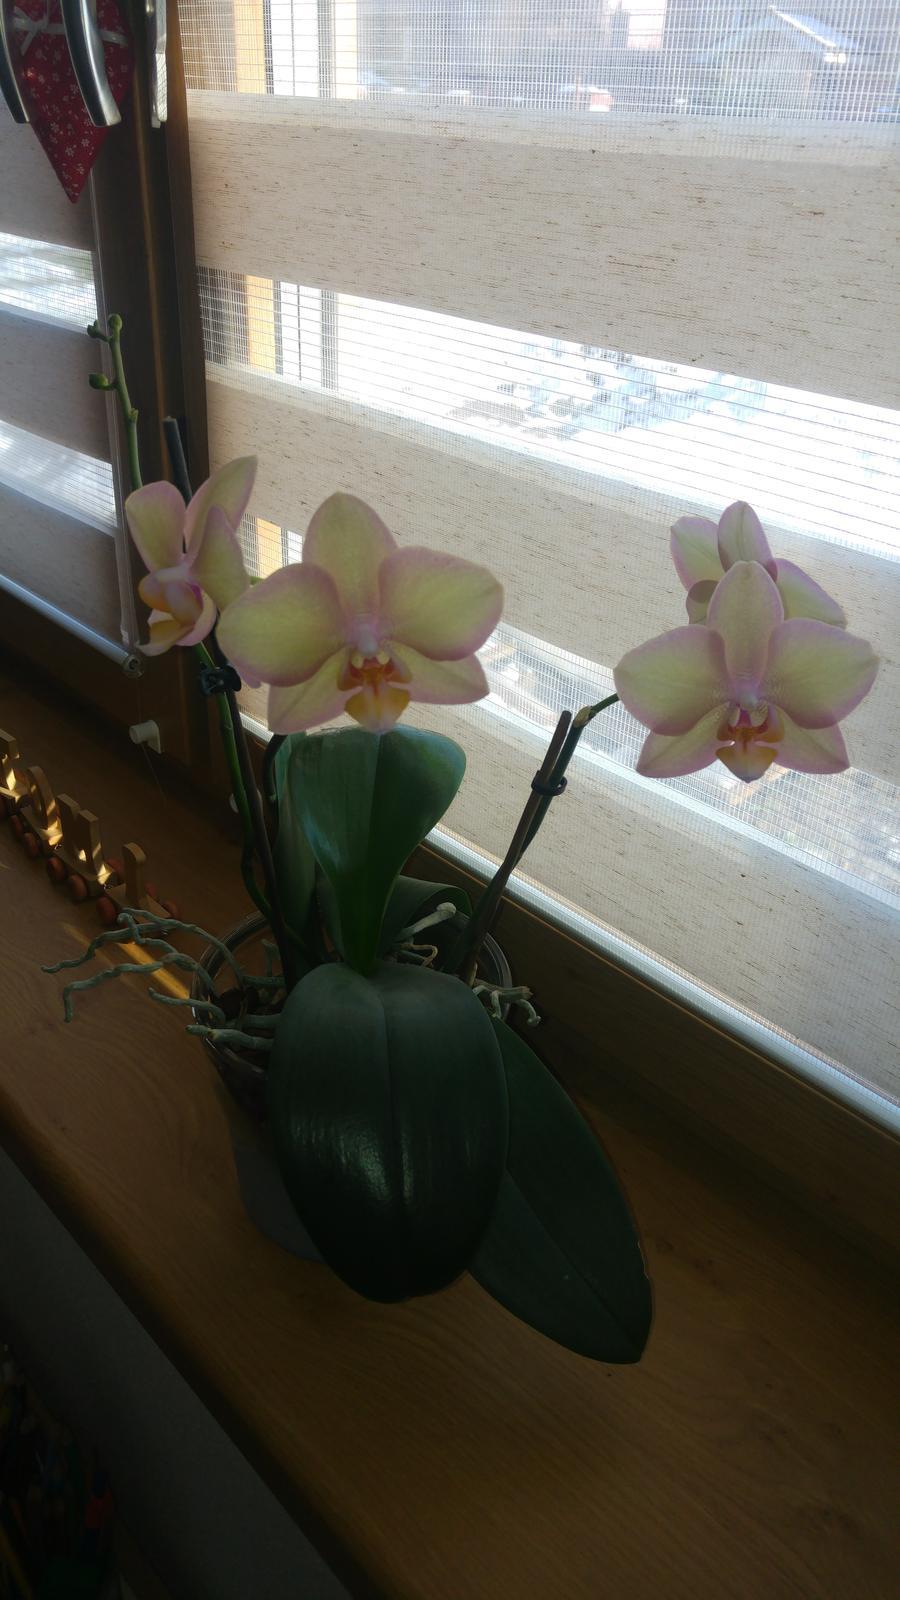 Moje krásne kvetinky - Orchidejka (12/2017) - 3 stonky